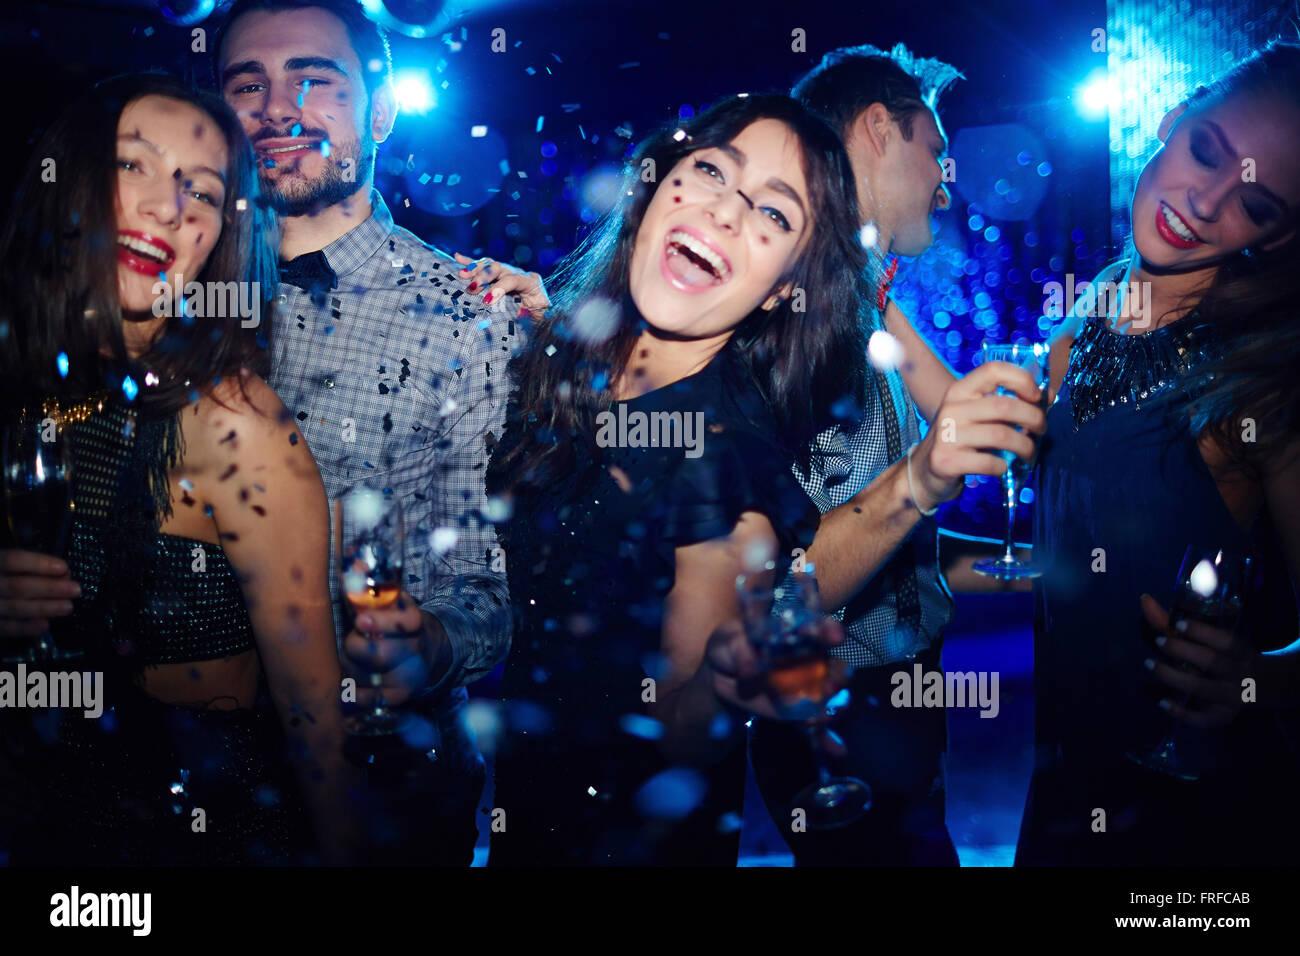 Dancing at party Photo Stock